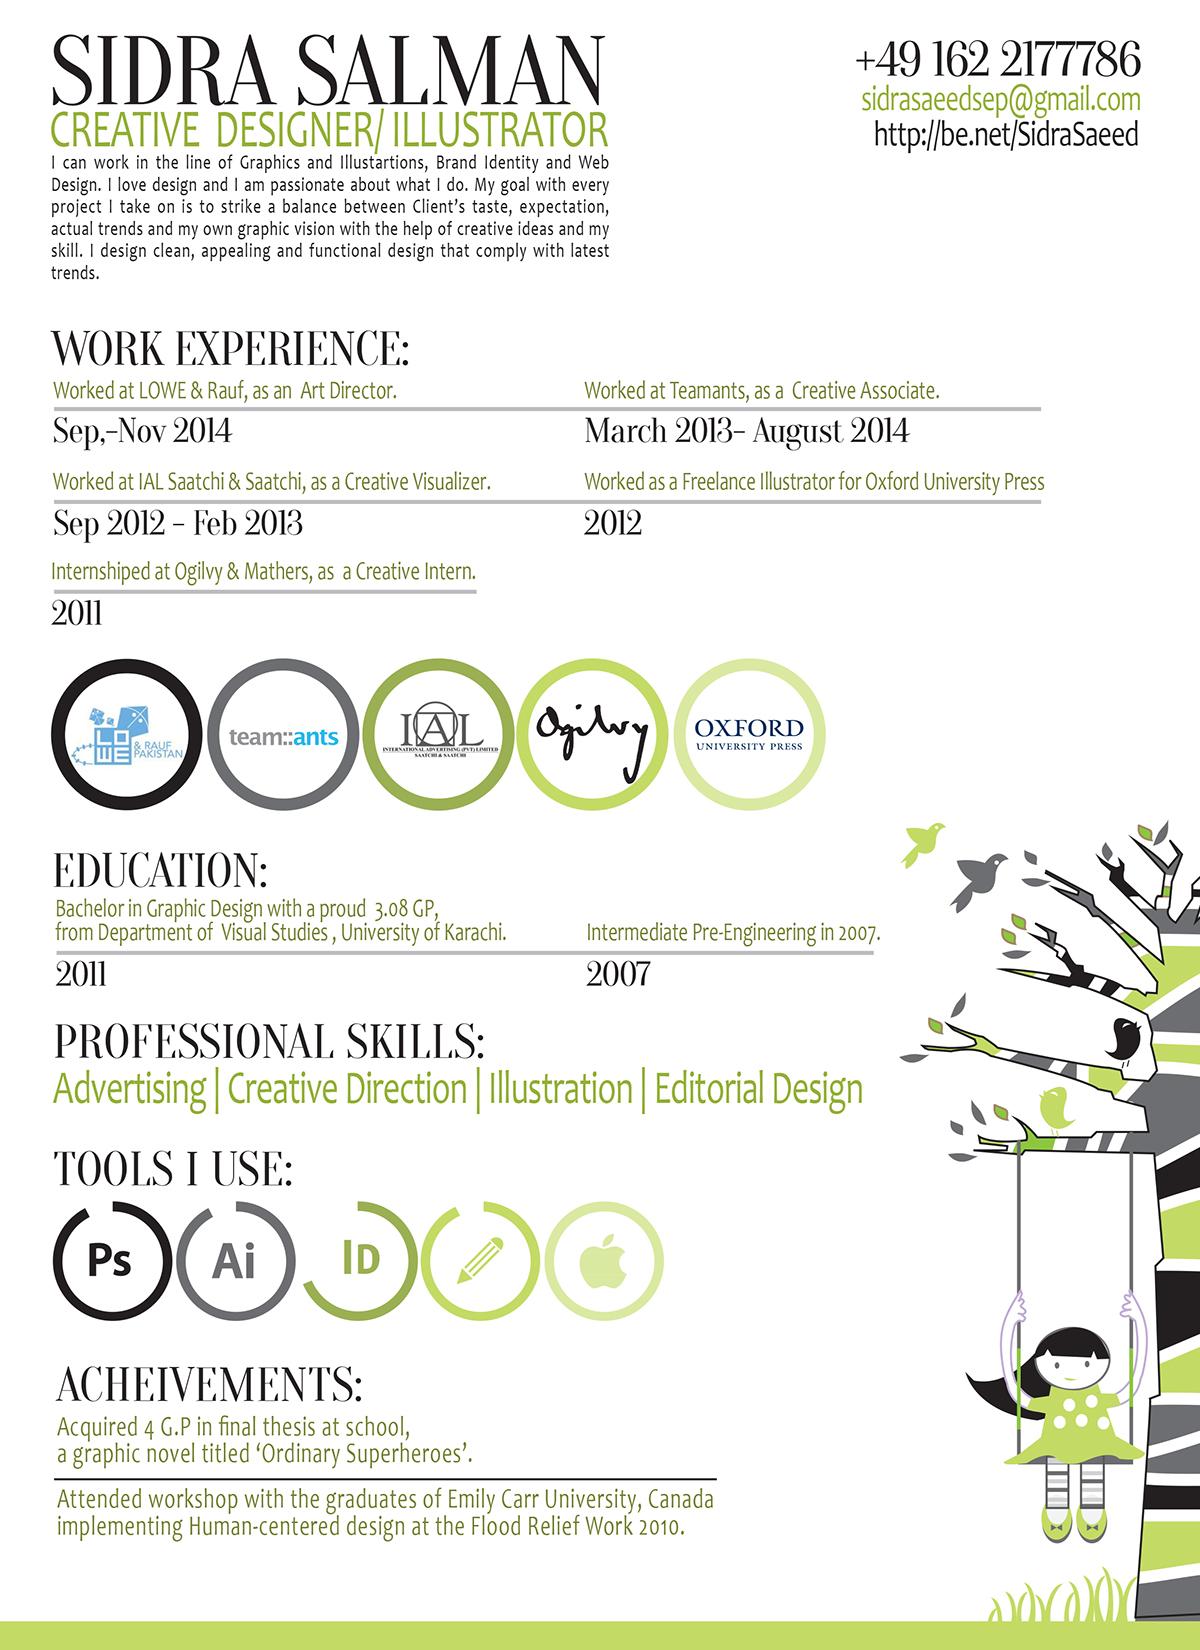 Sidra Salman | Resume on Behance